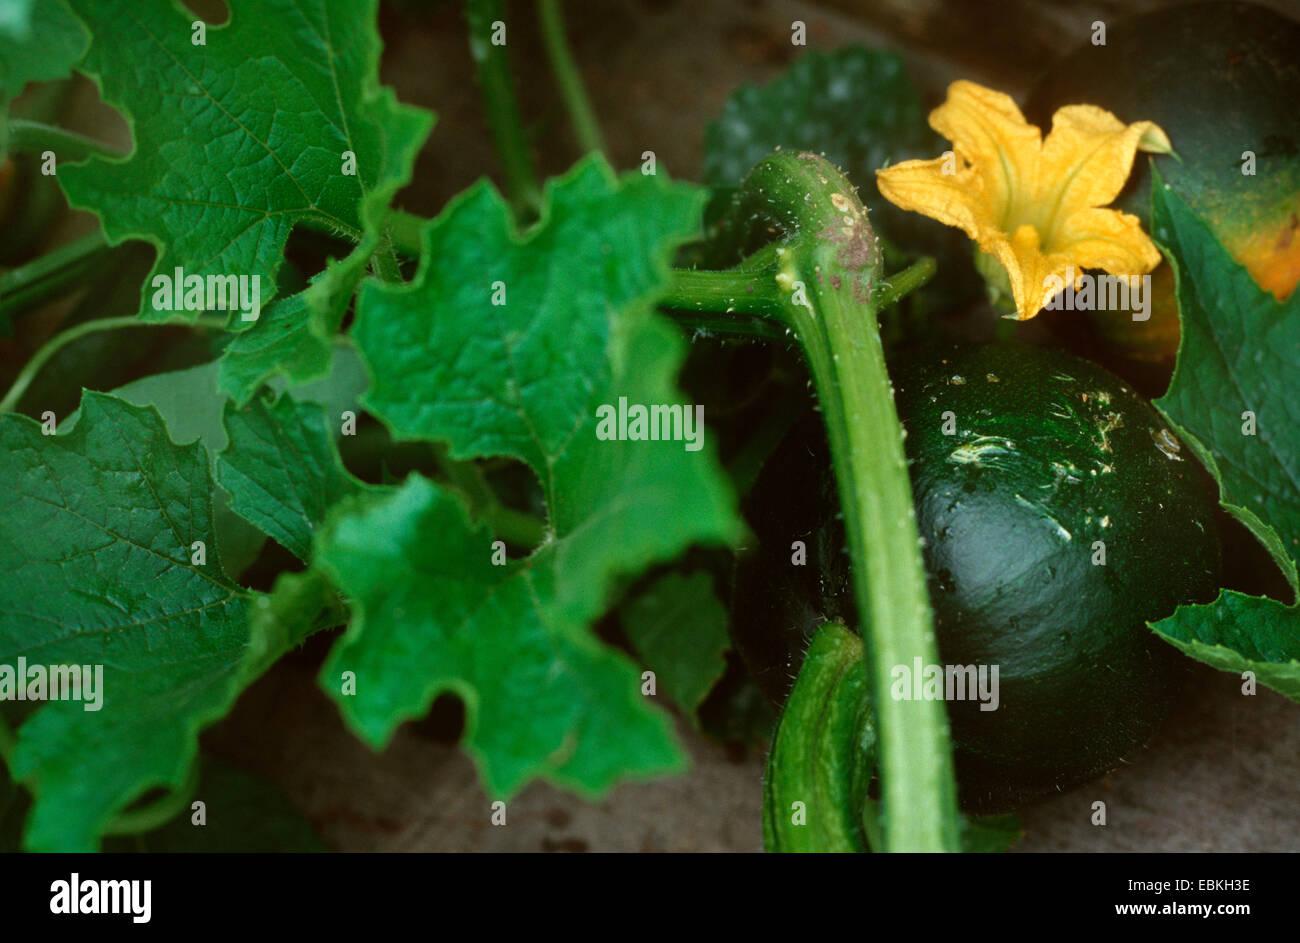 marrow, field pumpkin (Cucurbita pepo 'Little Gem', Cucurbita pepo Little Gem), with flower und Frucht - Stock Image